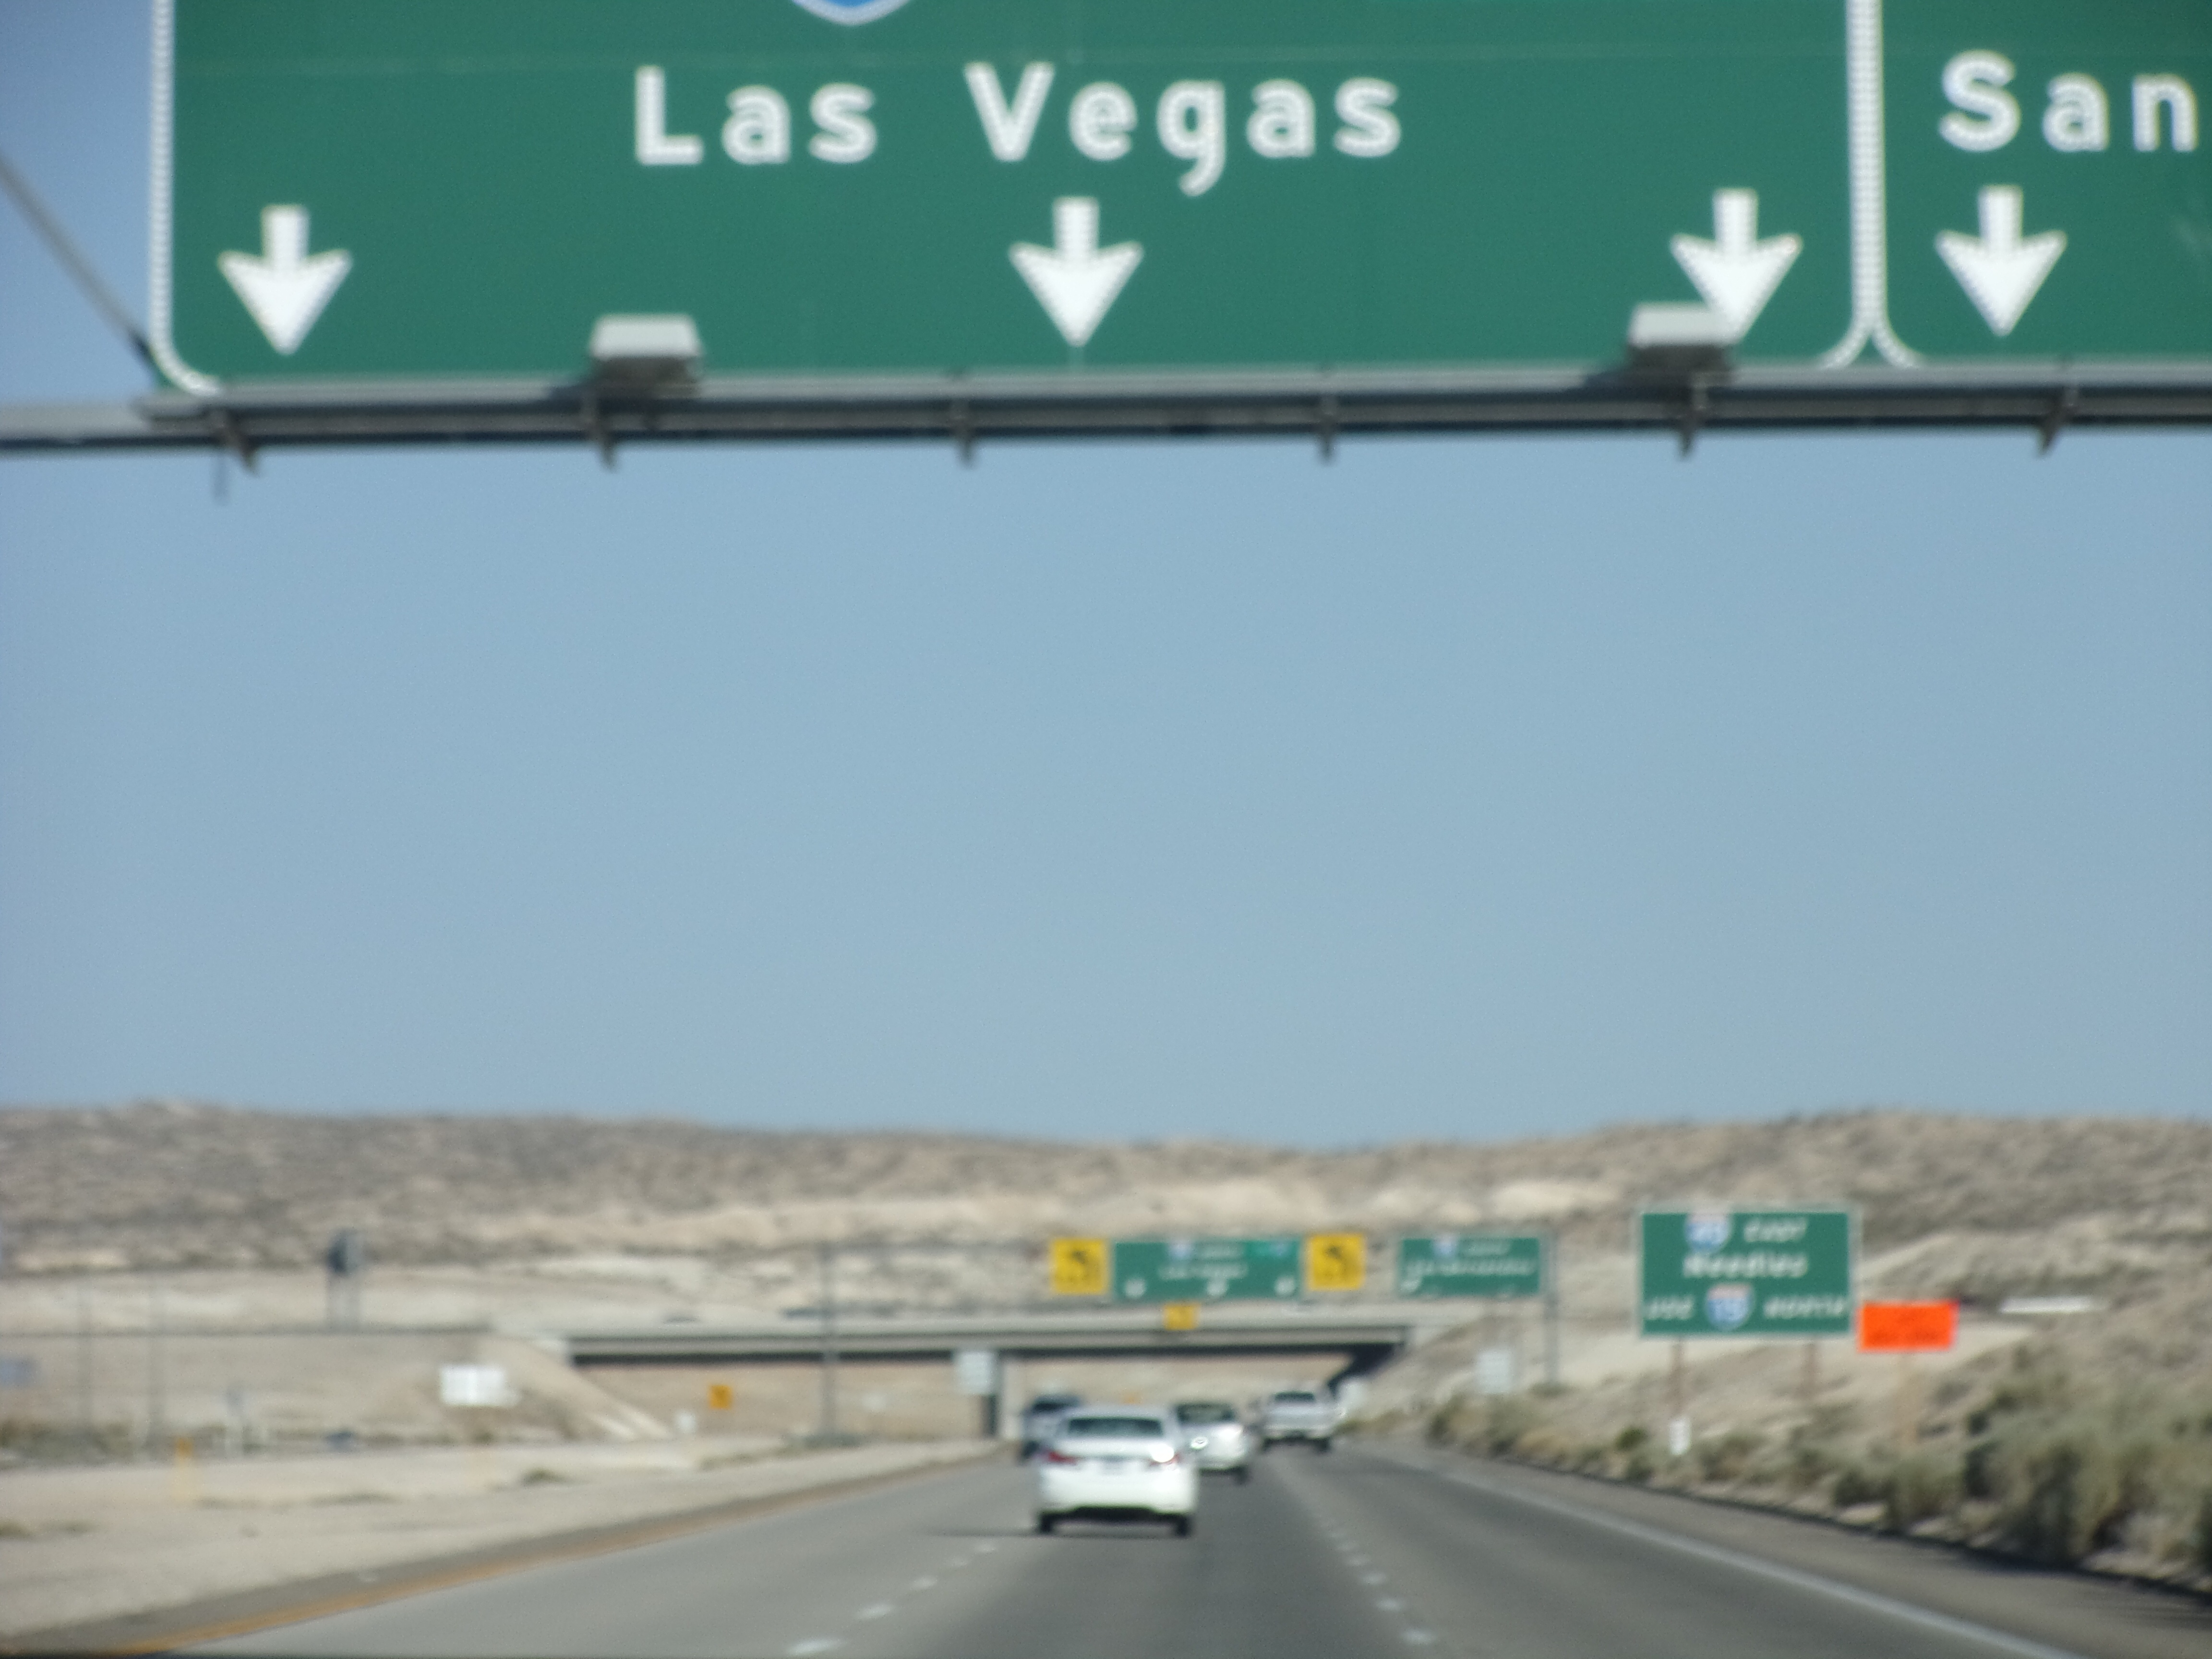 Uhrzeit Las Vegas Jetzt